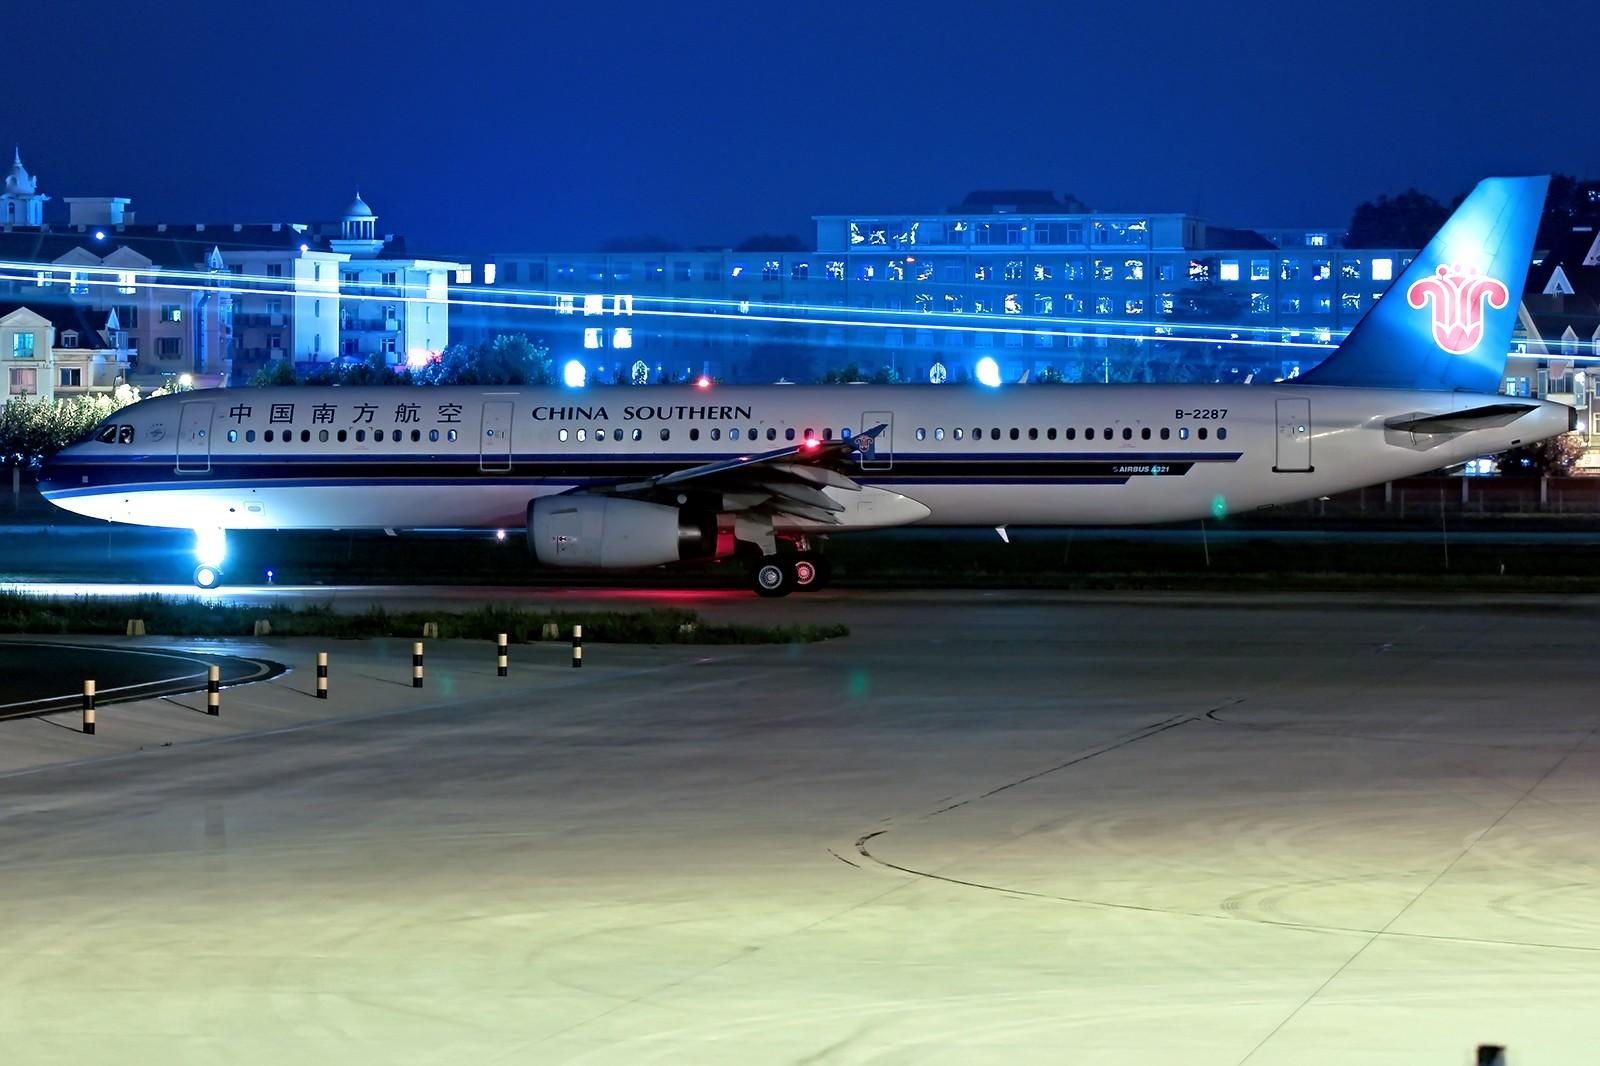 Re:[DLC]。。。璀璨星计划。。。夜 AIRBUS A321-200 B-2287 中国大连周水子国际机场